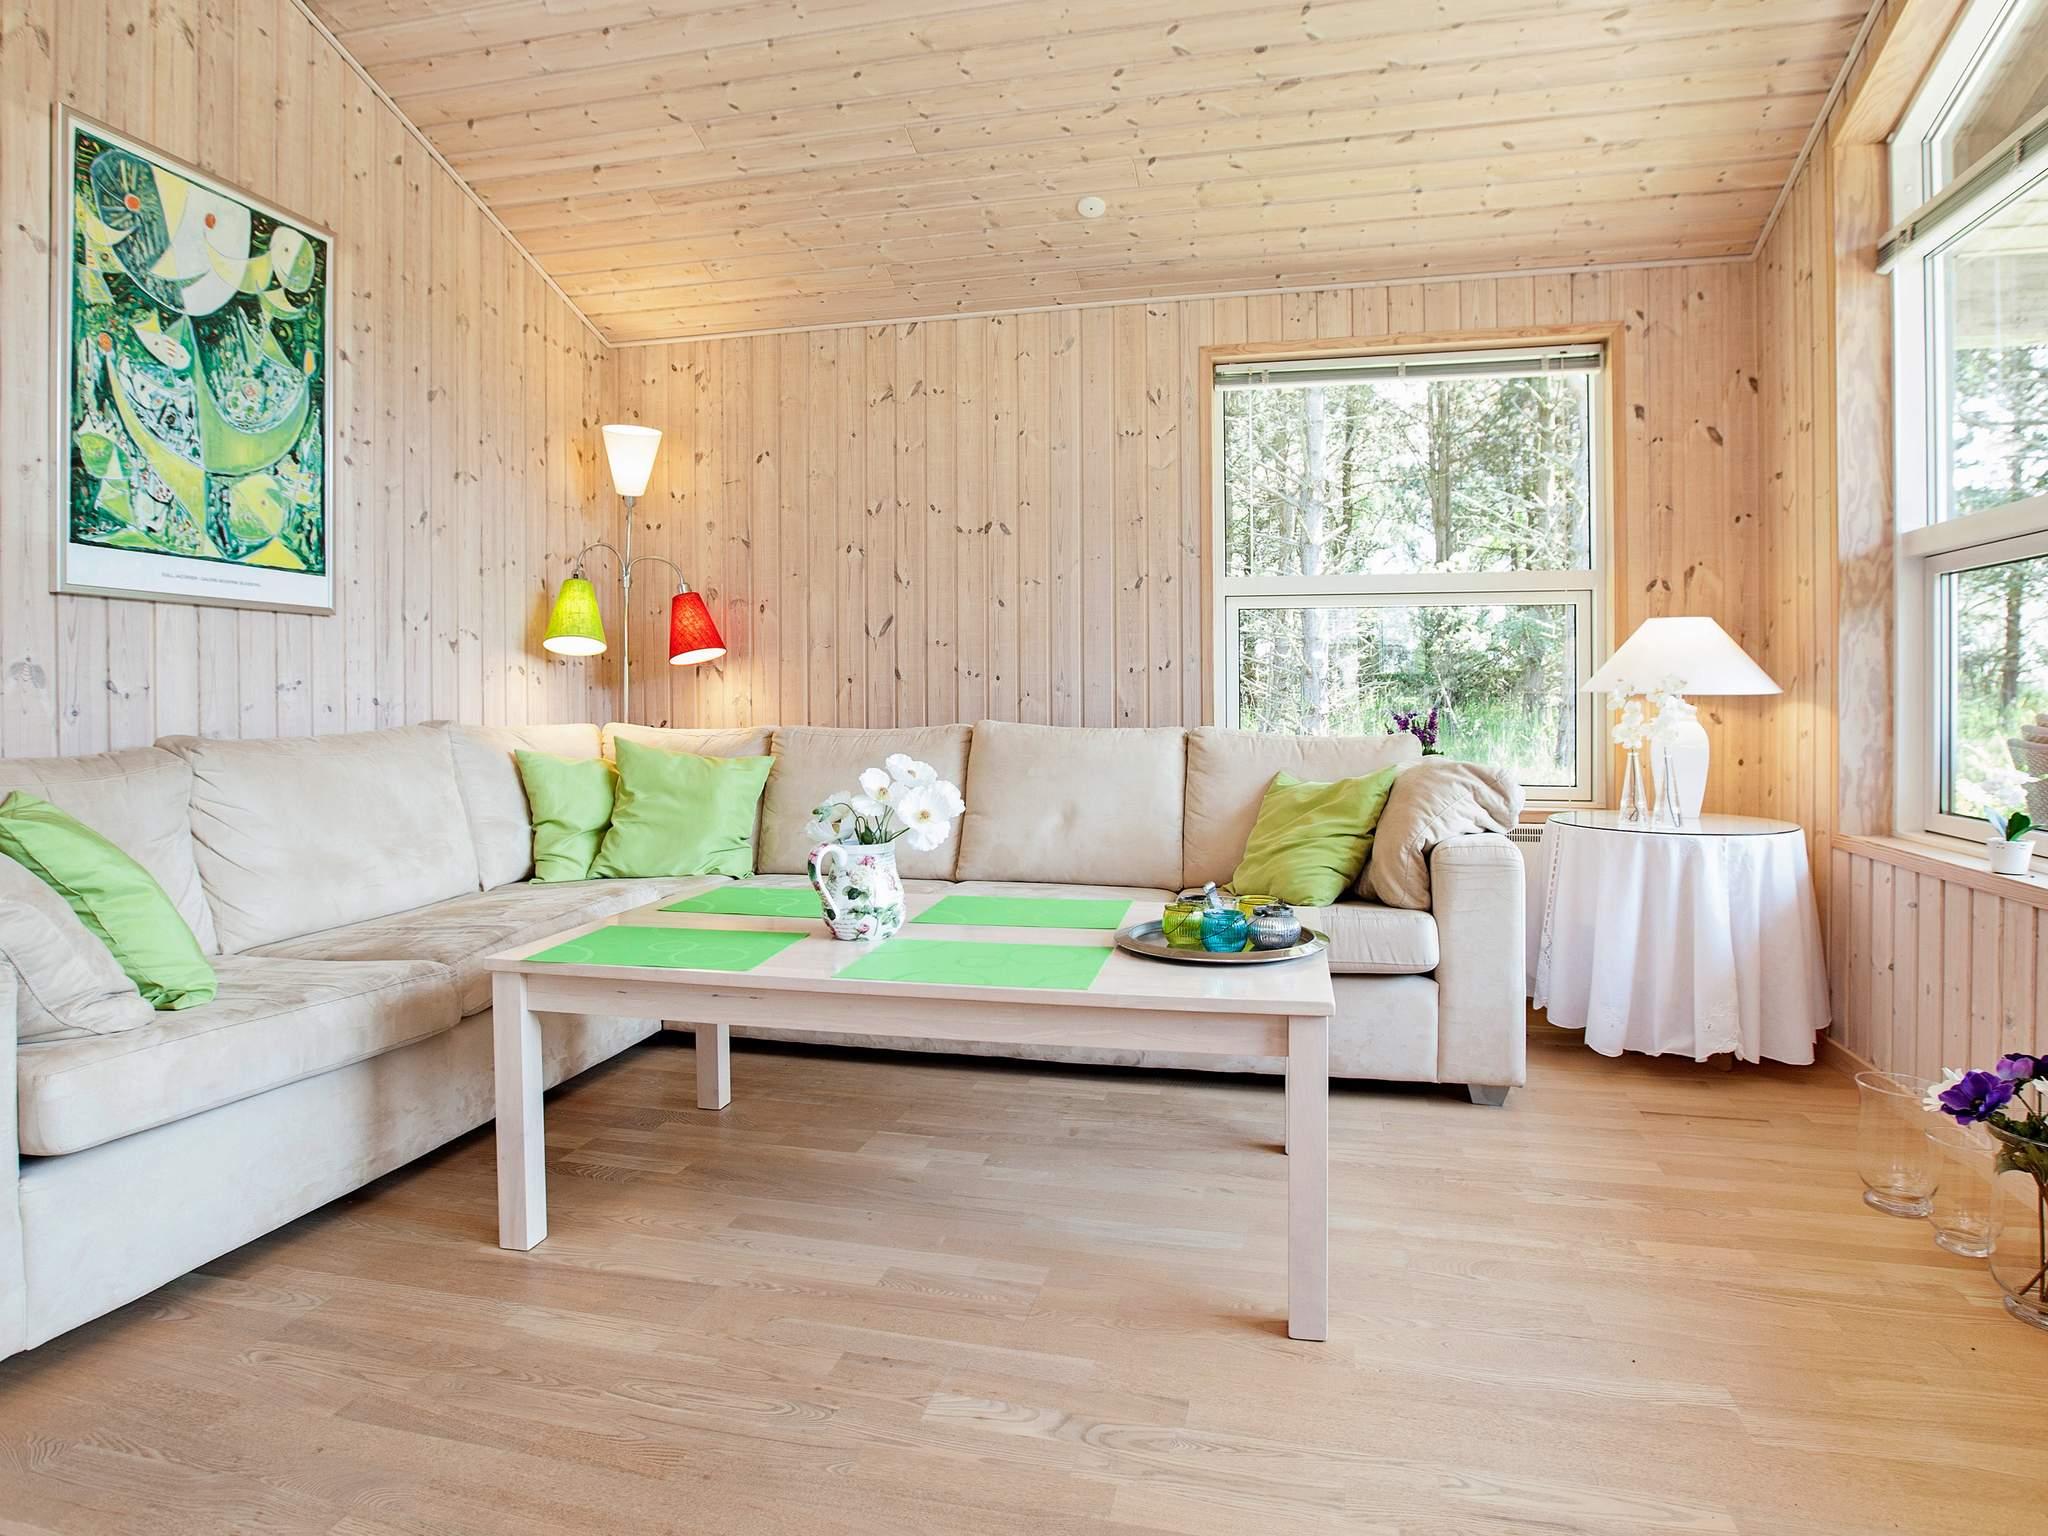 Ferienhaus Hyldtofte Østersøbad (93262), Hyldtofte Fæland, , Lolland, Dänemark, Bild 5